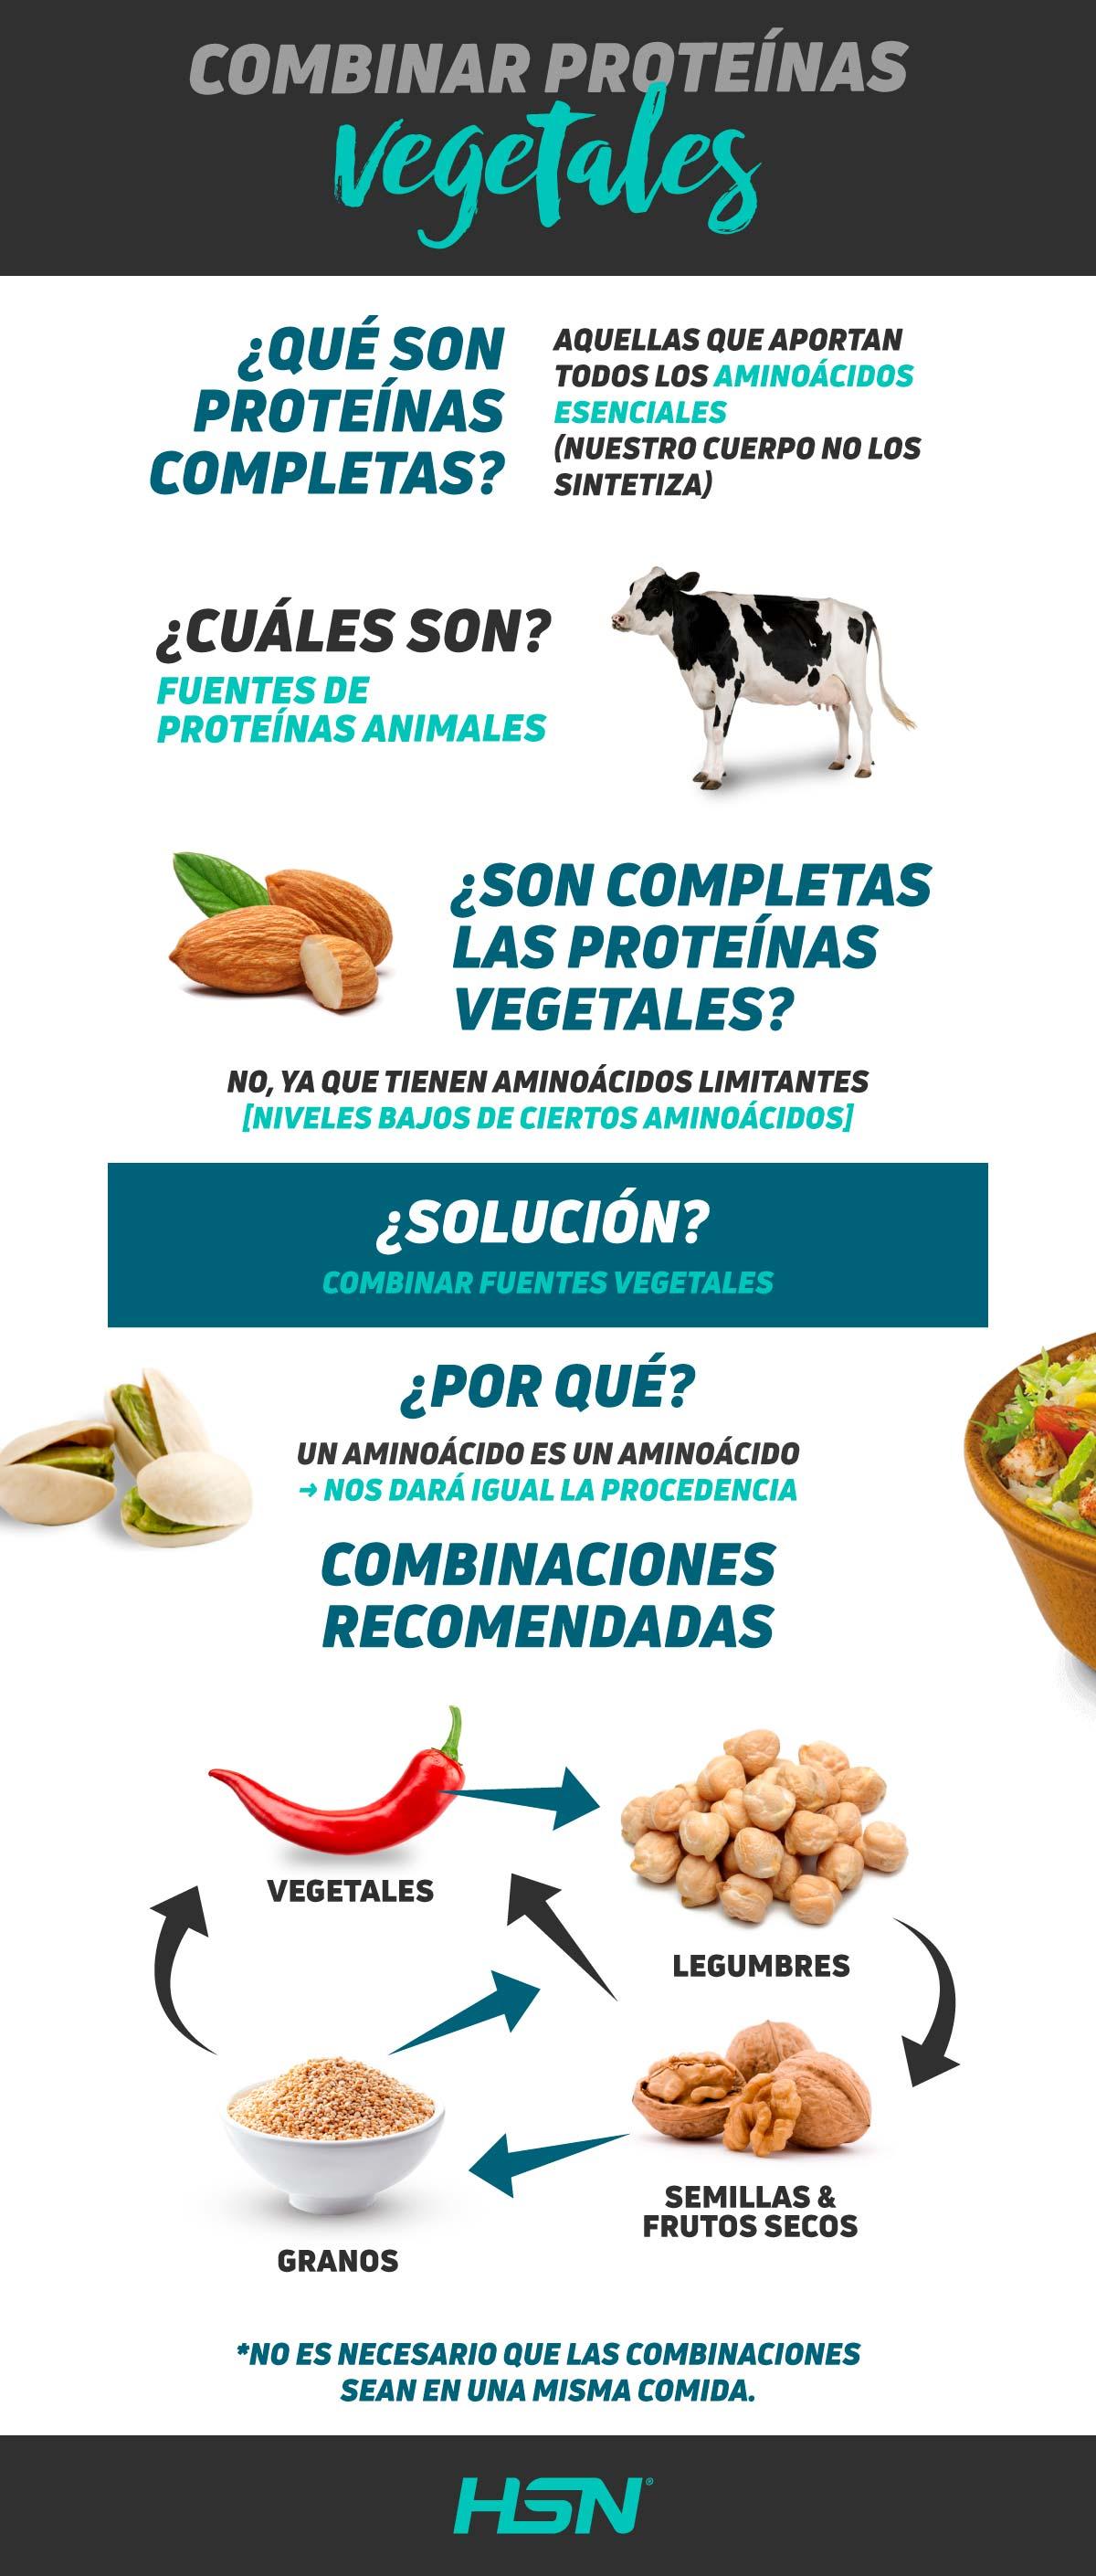 Combinar proteinas vegetales